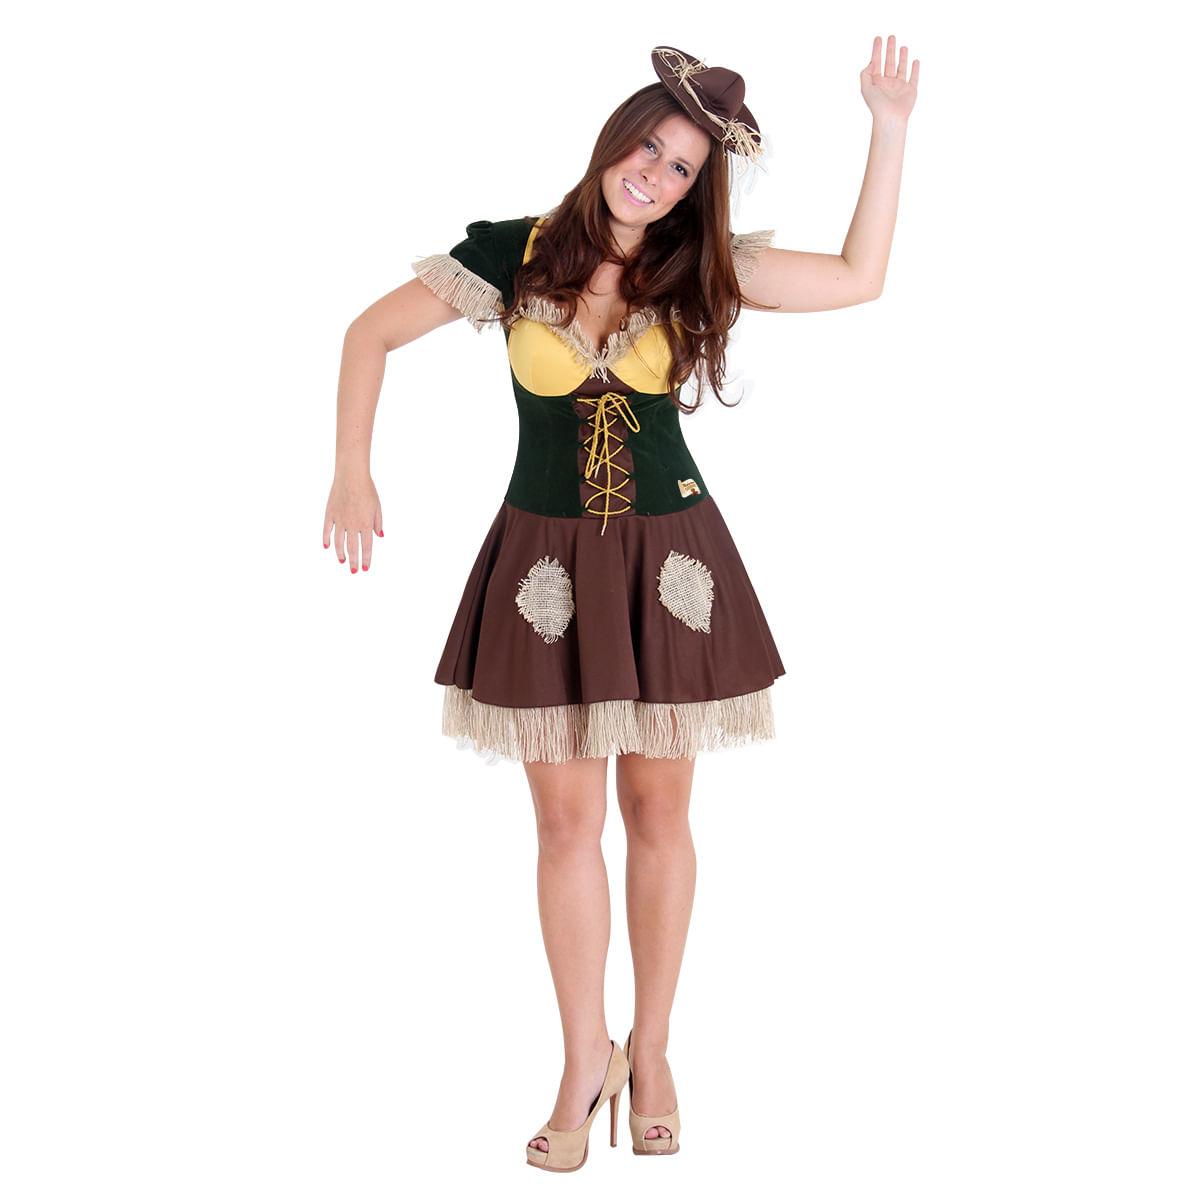 Fantasia Espantalho Feminino Teen - Magico de Oz